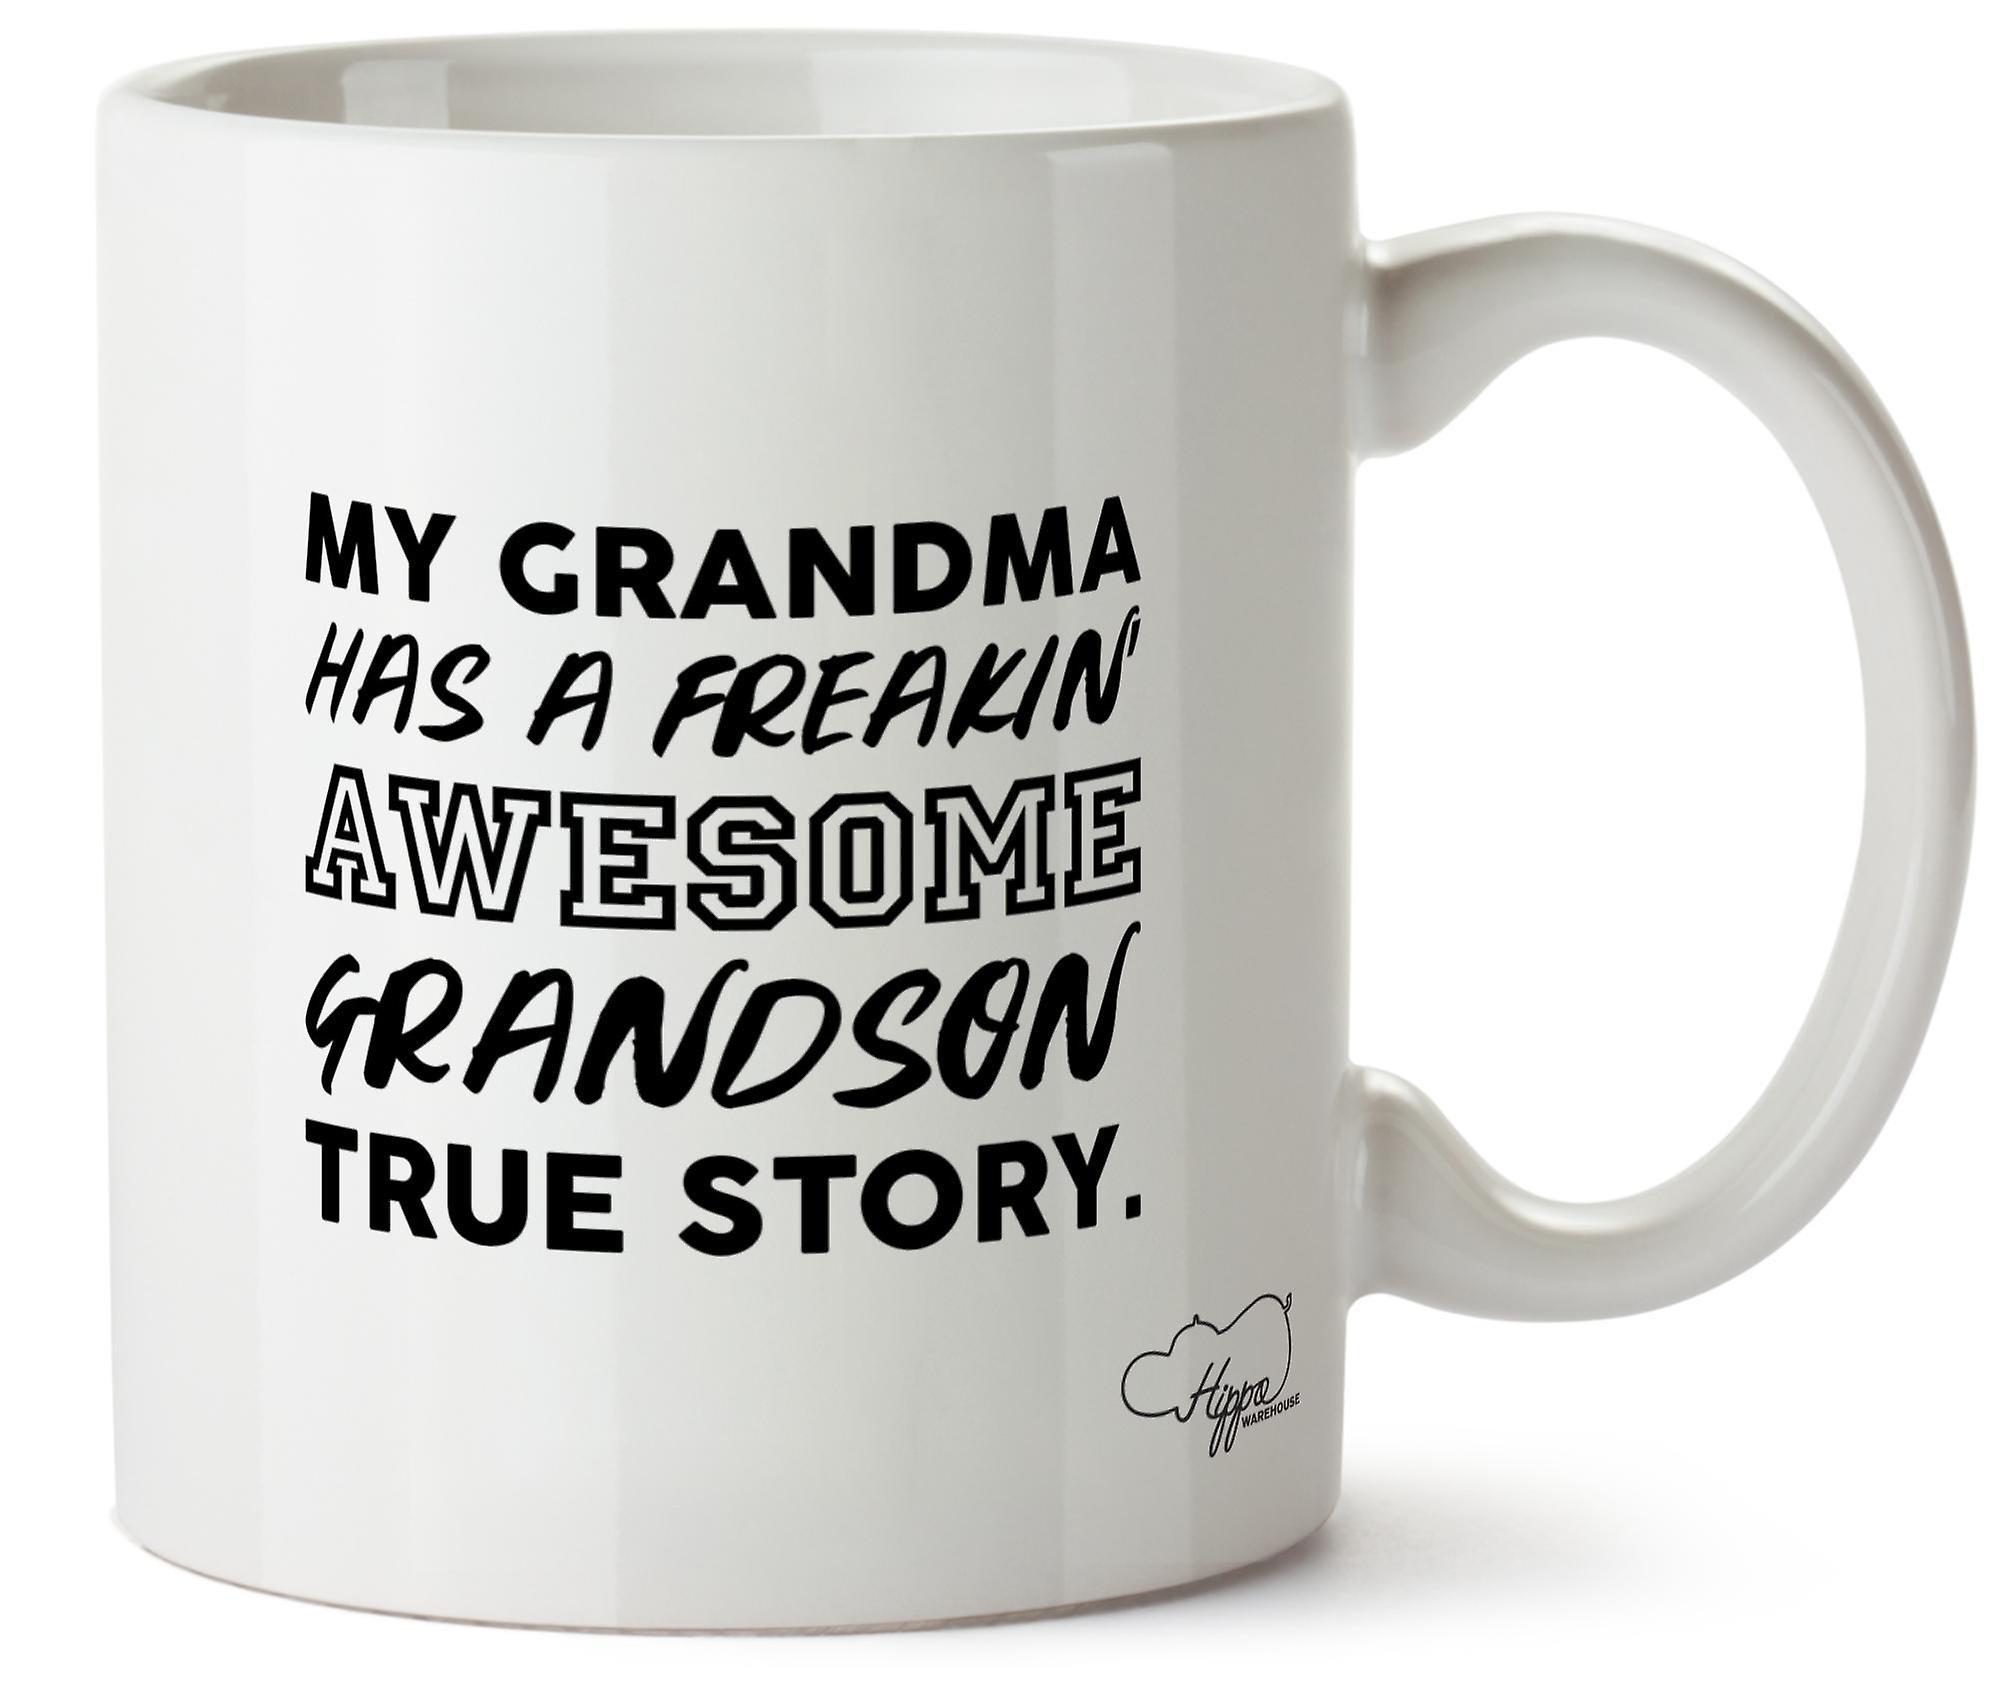 Hippowarehouse My Grandma Has A Freakin' Awesome Grandson True Story. Printed Mug Cup Ceramic 10oz